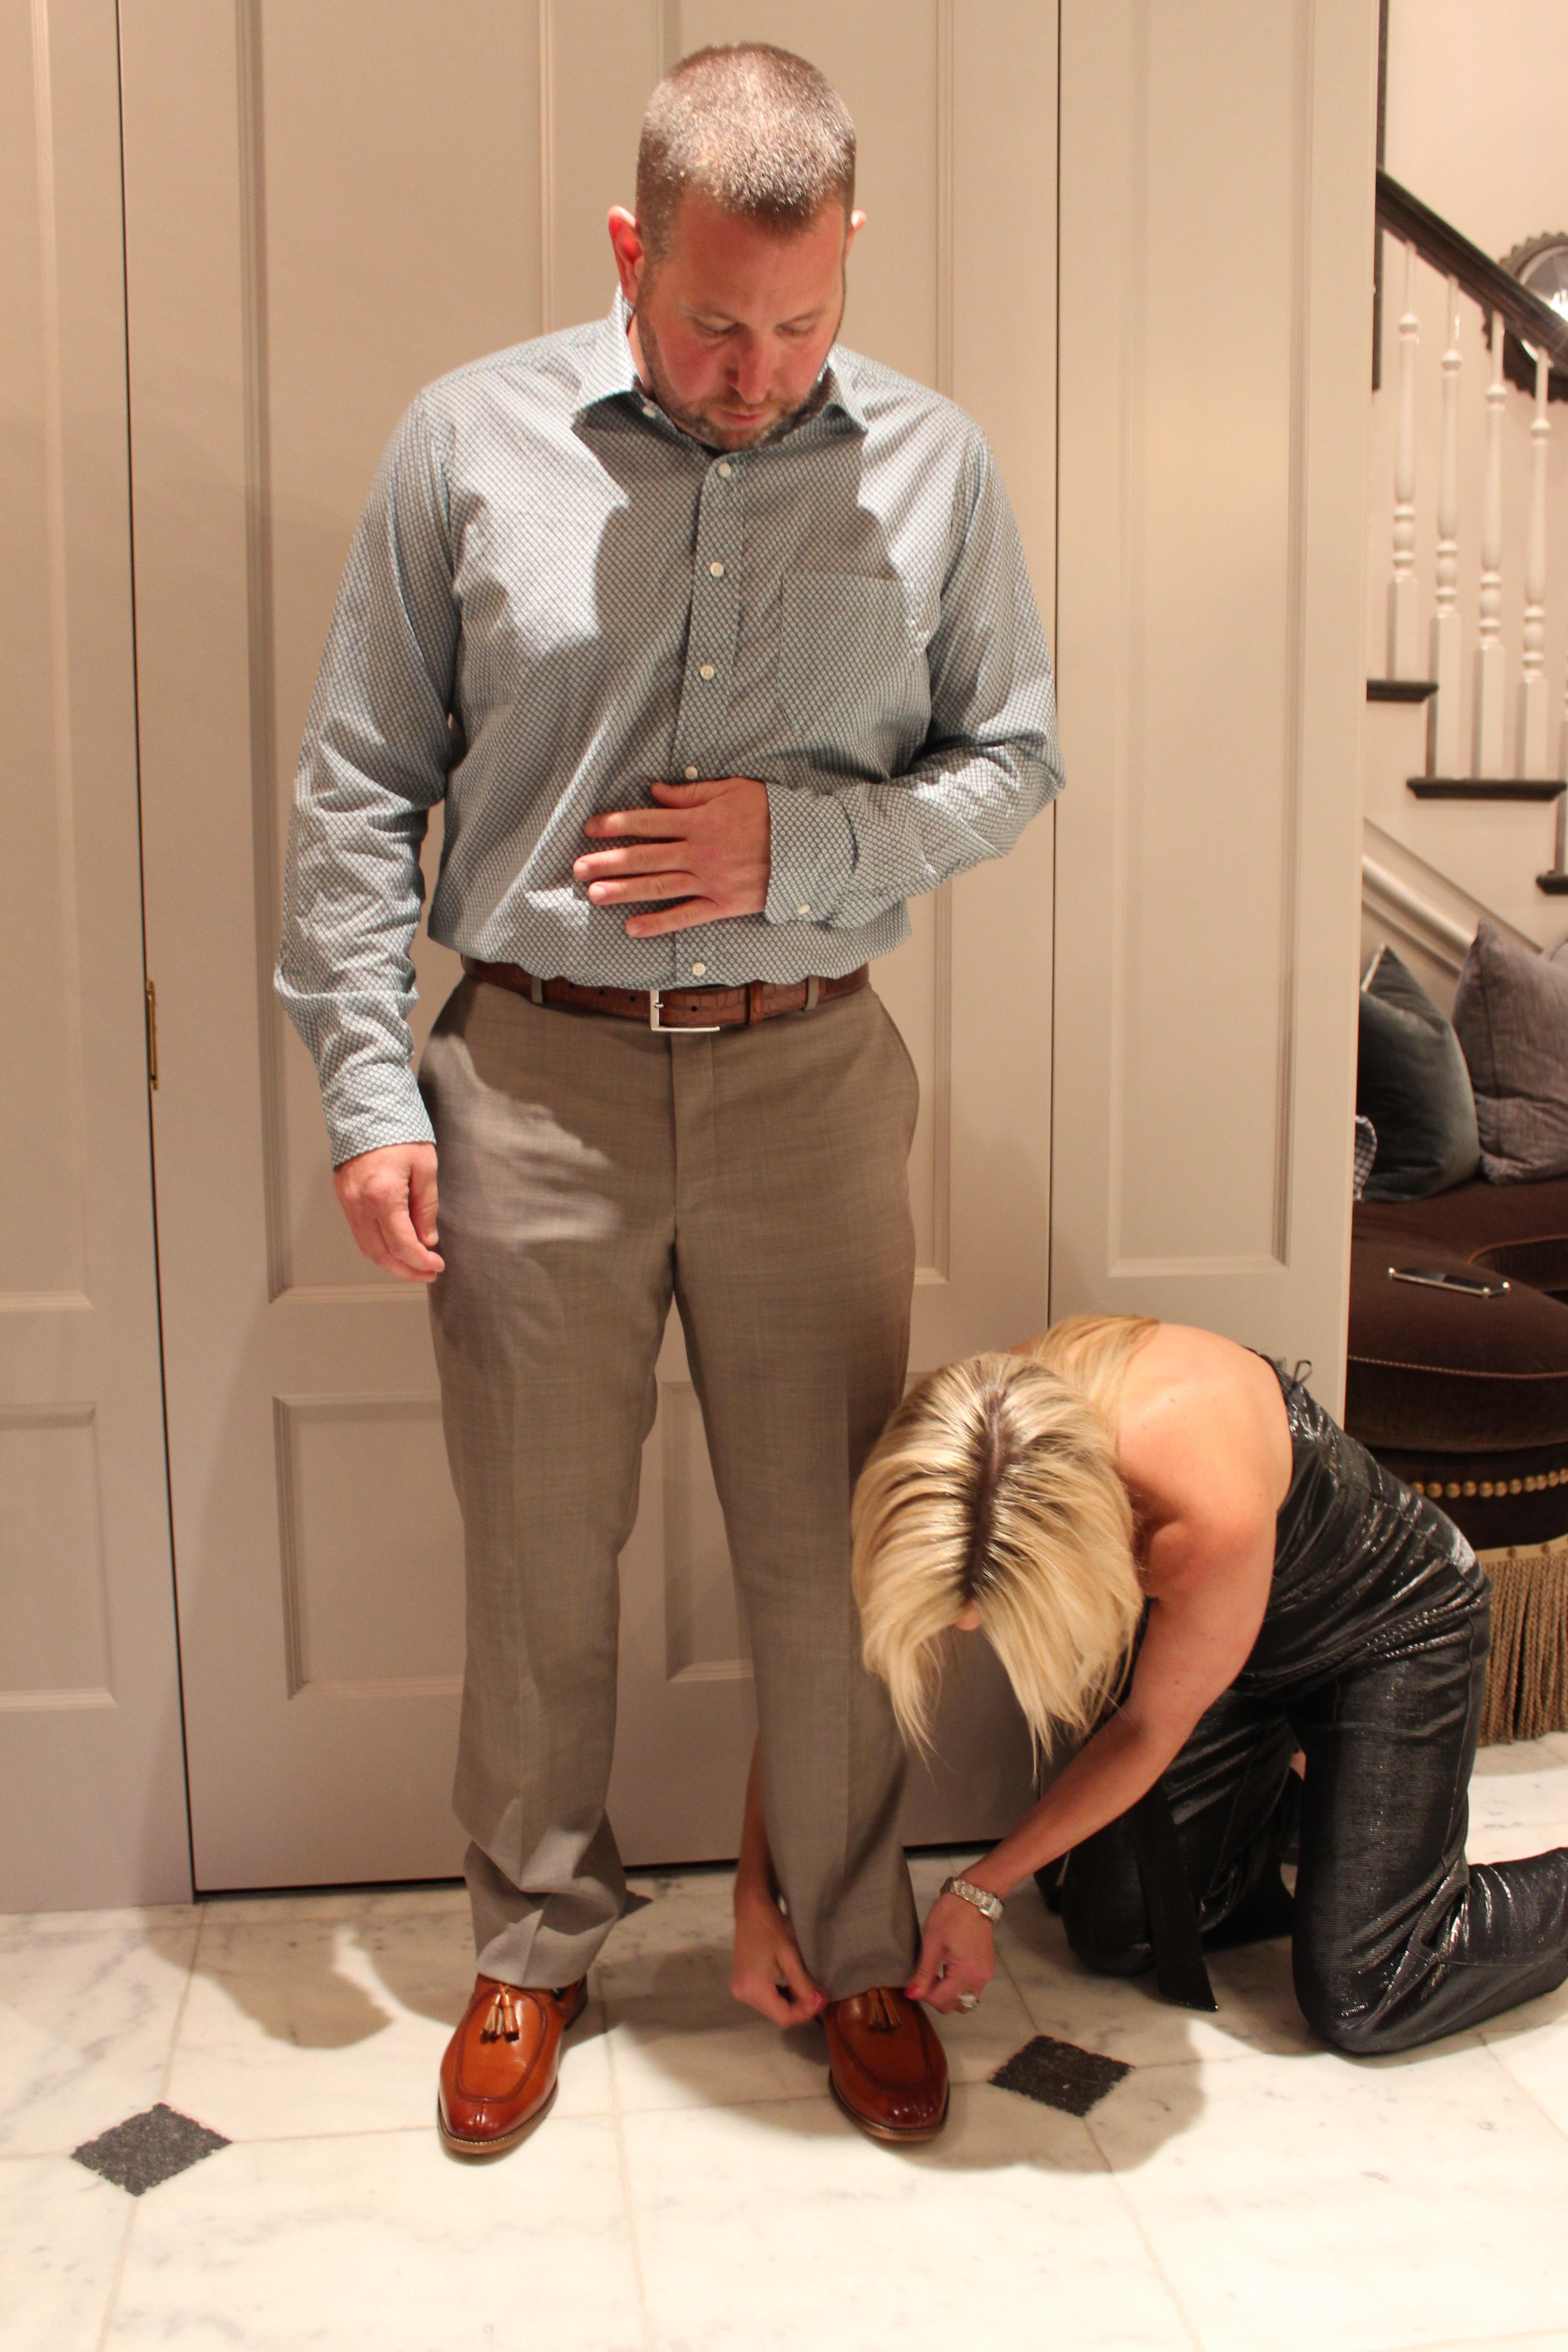 Men's Personal Shopping, Men's personal fitting, tailoring men's pants